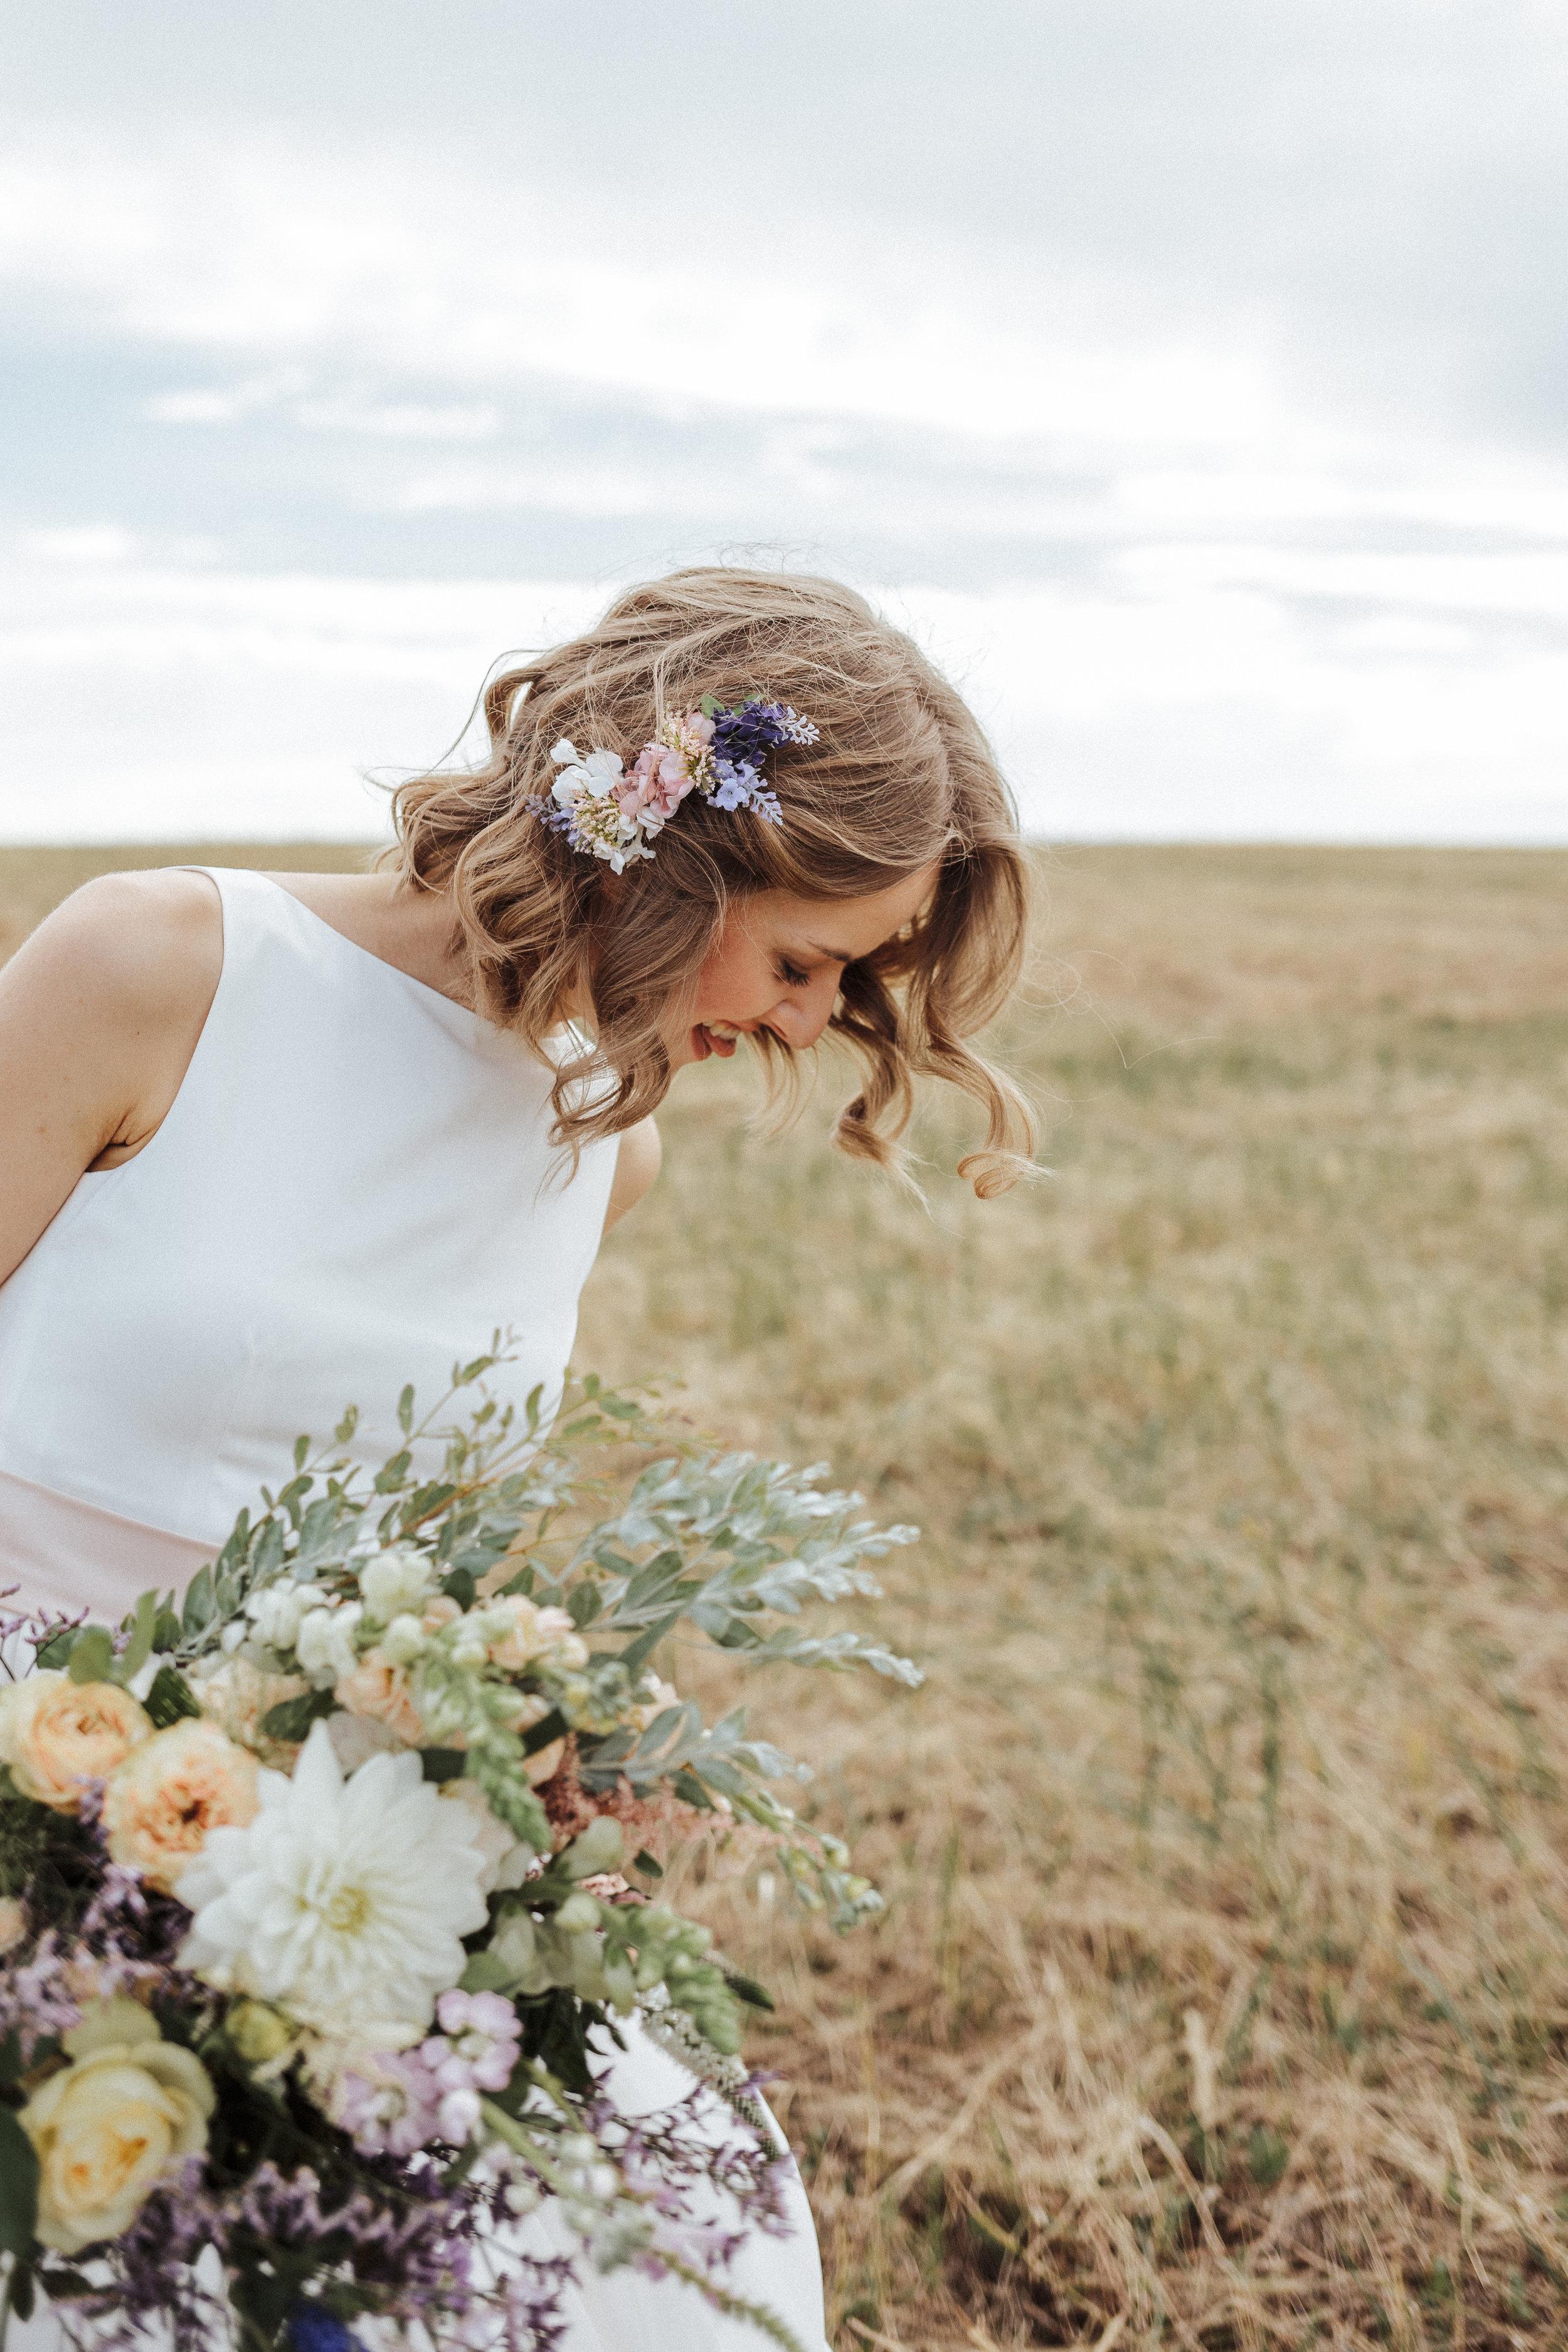 20170902_Monika+Marci_wedding_f_194__MG_5280_1.jpg